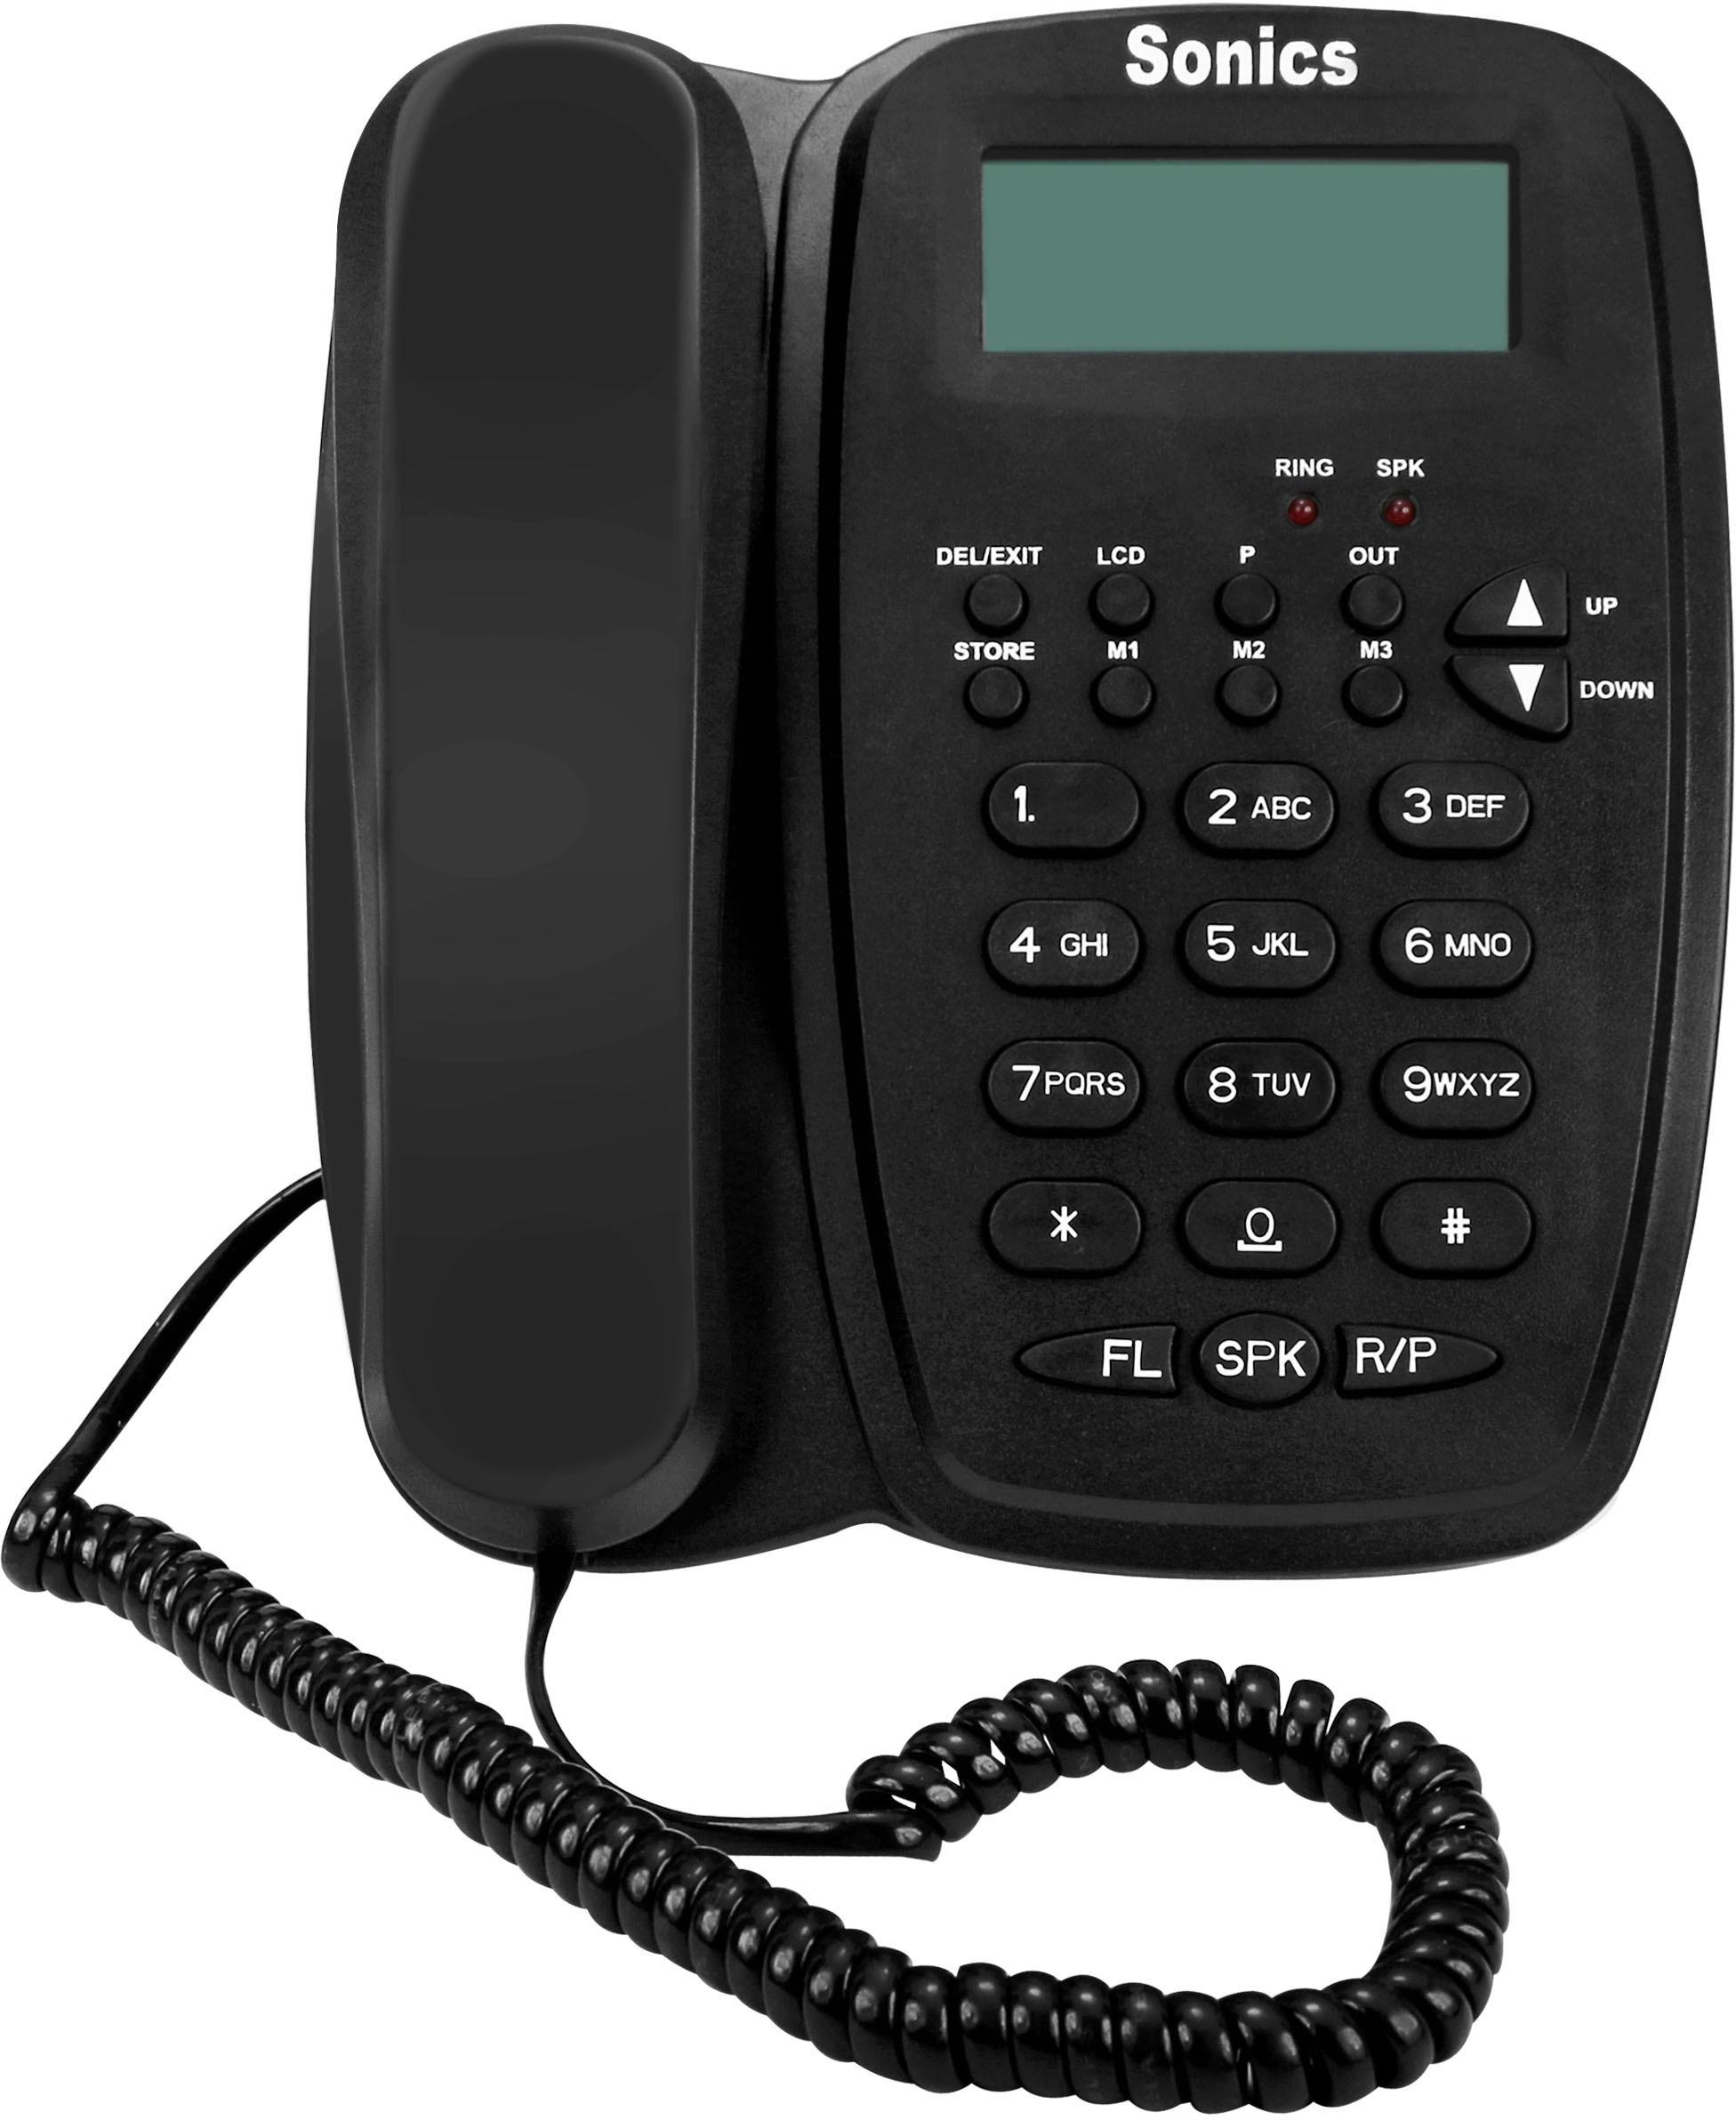 View Sonics SS-916 Corded Landline Phone(Black) Home Appliances Price Online(Sonics)